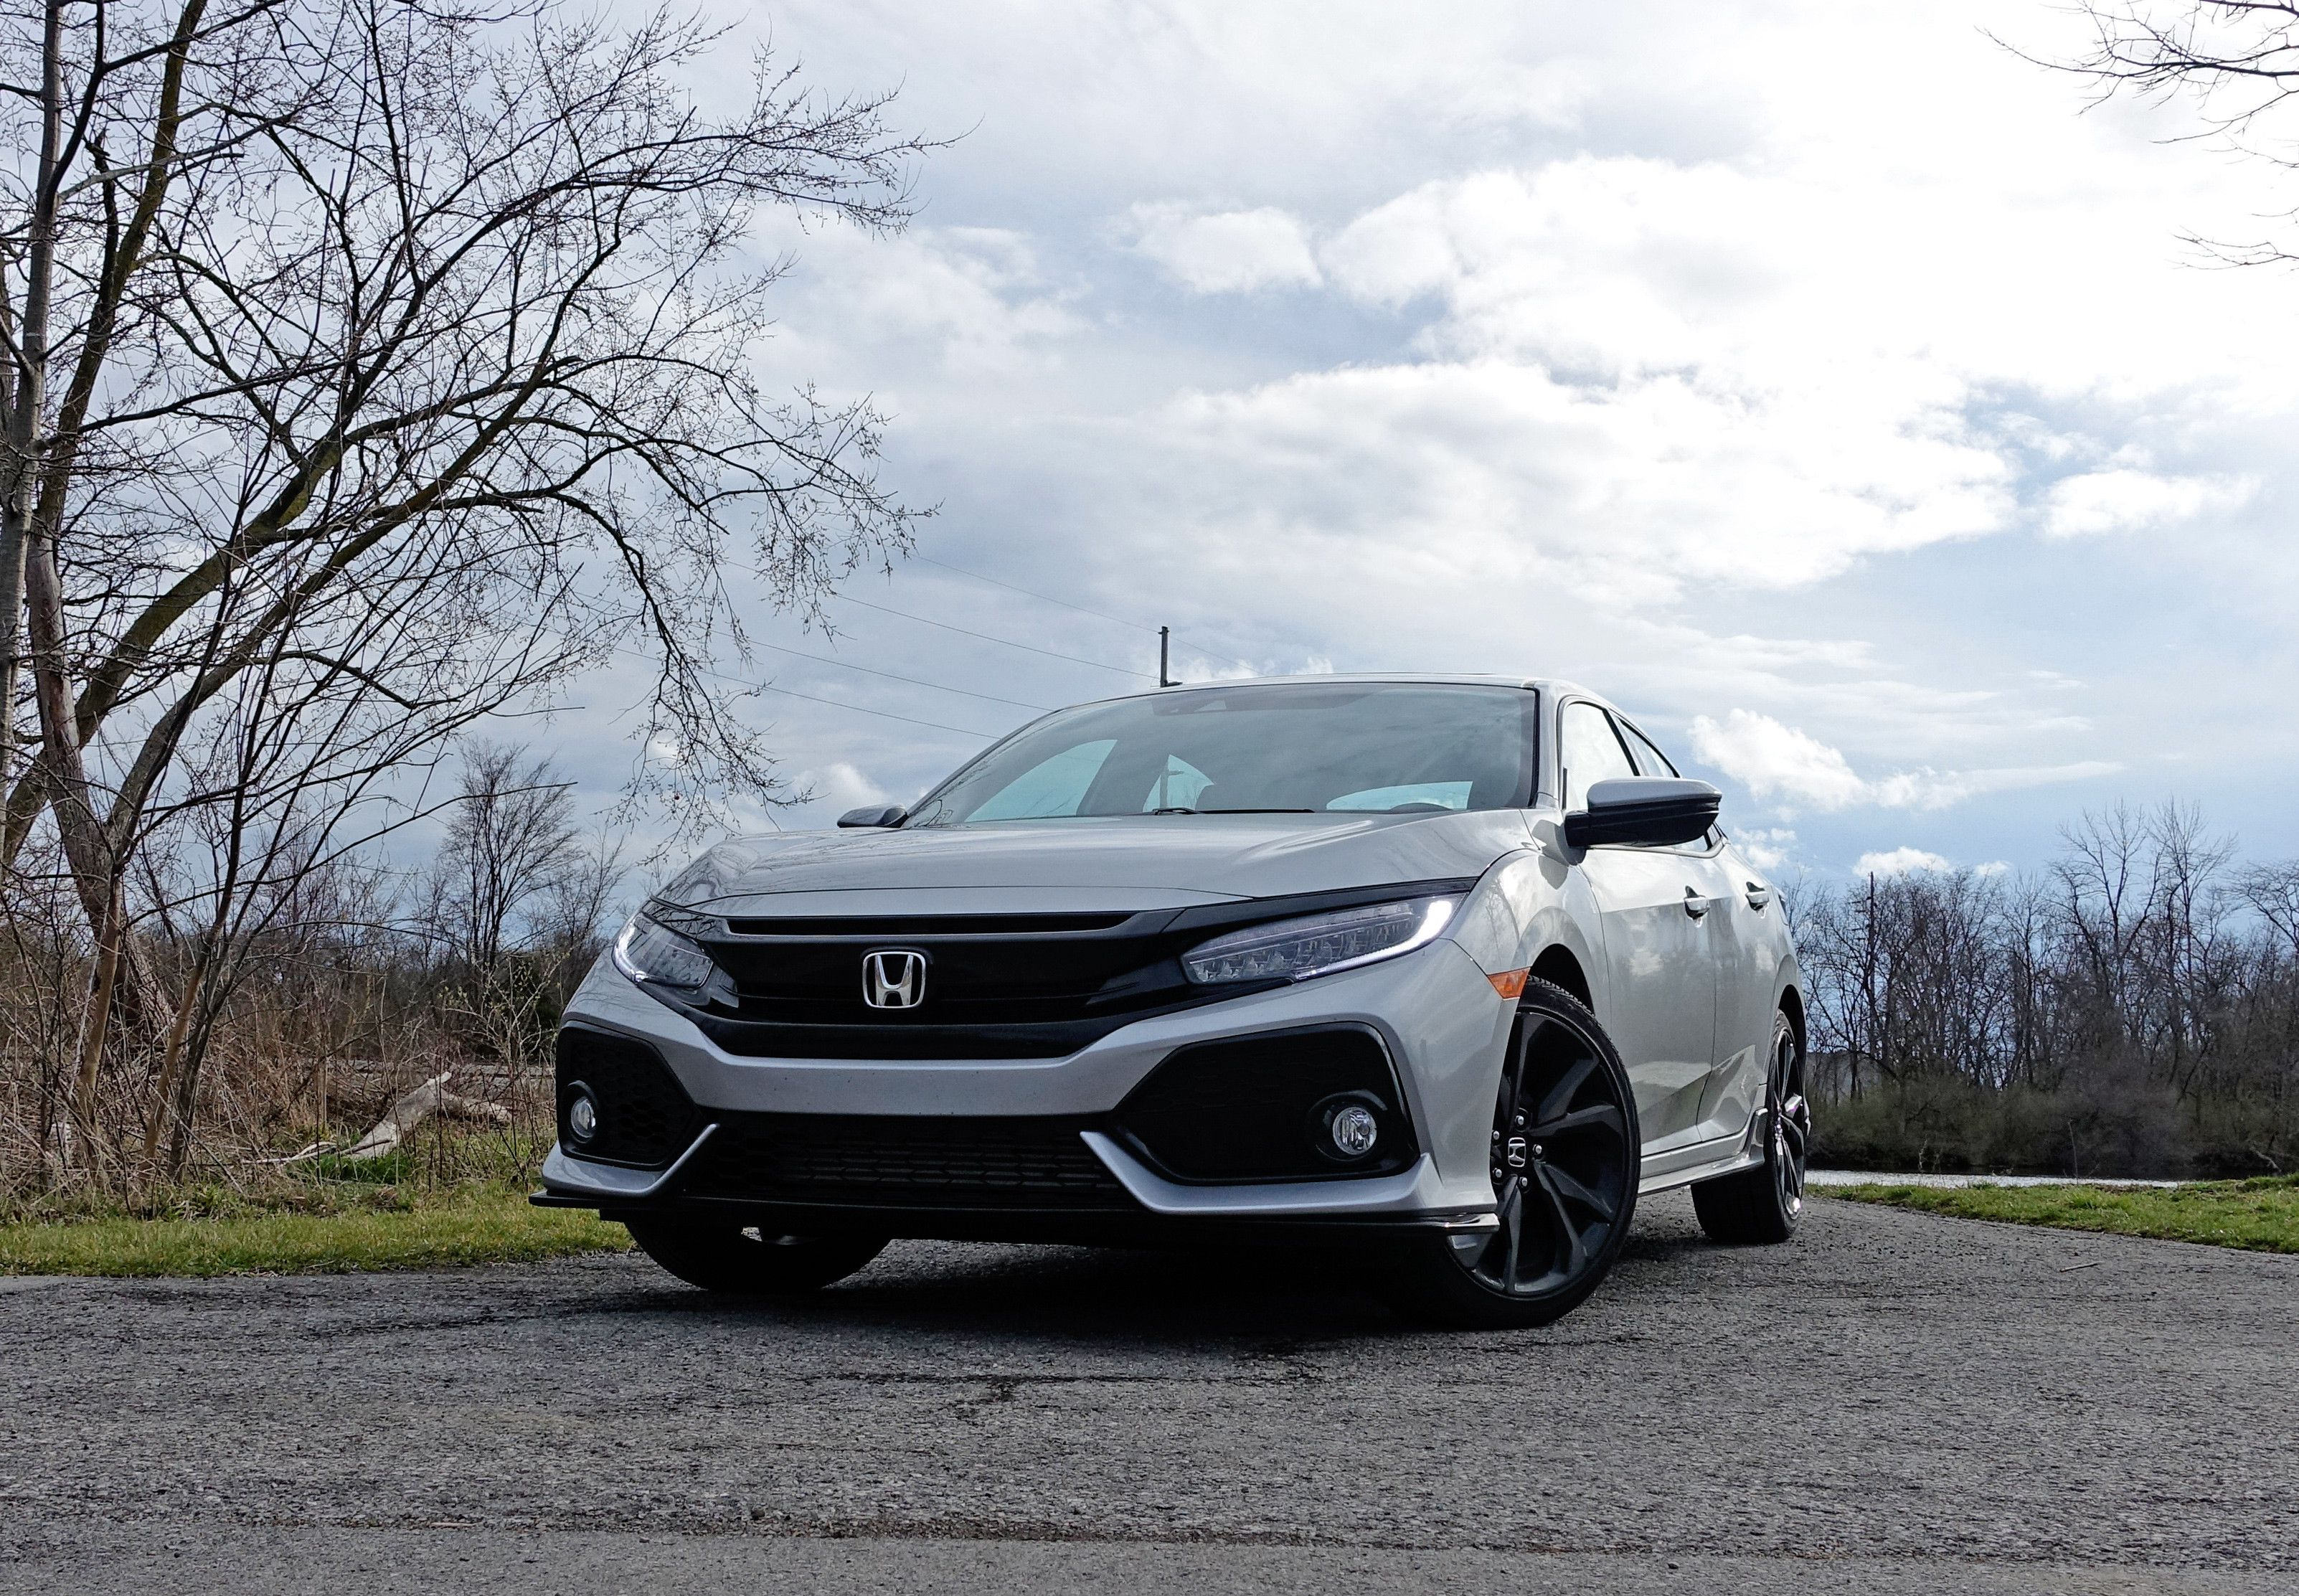 35 2017 Honda Civic Hatchback Sport Touring Ee2b Honda Civic Hatchback Civic Hatchback Sport Touring